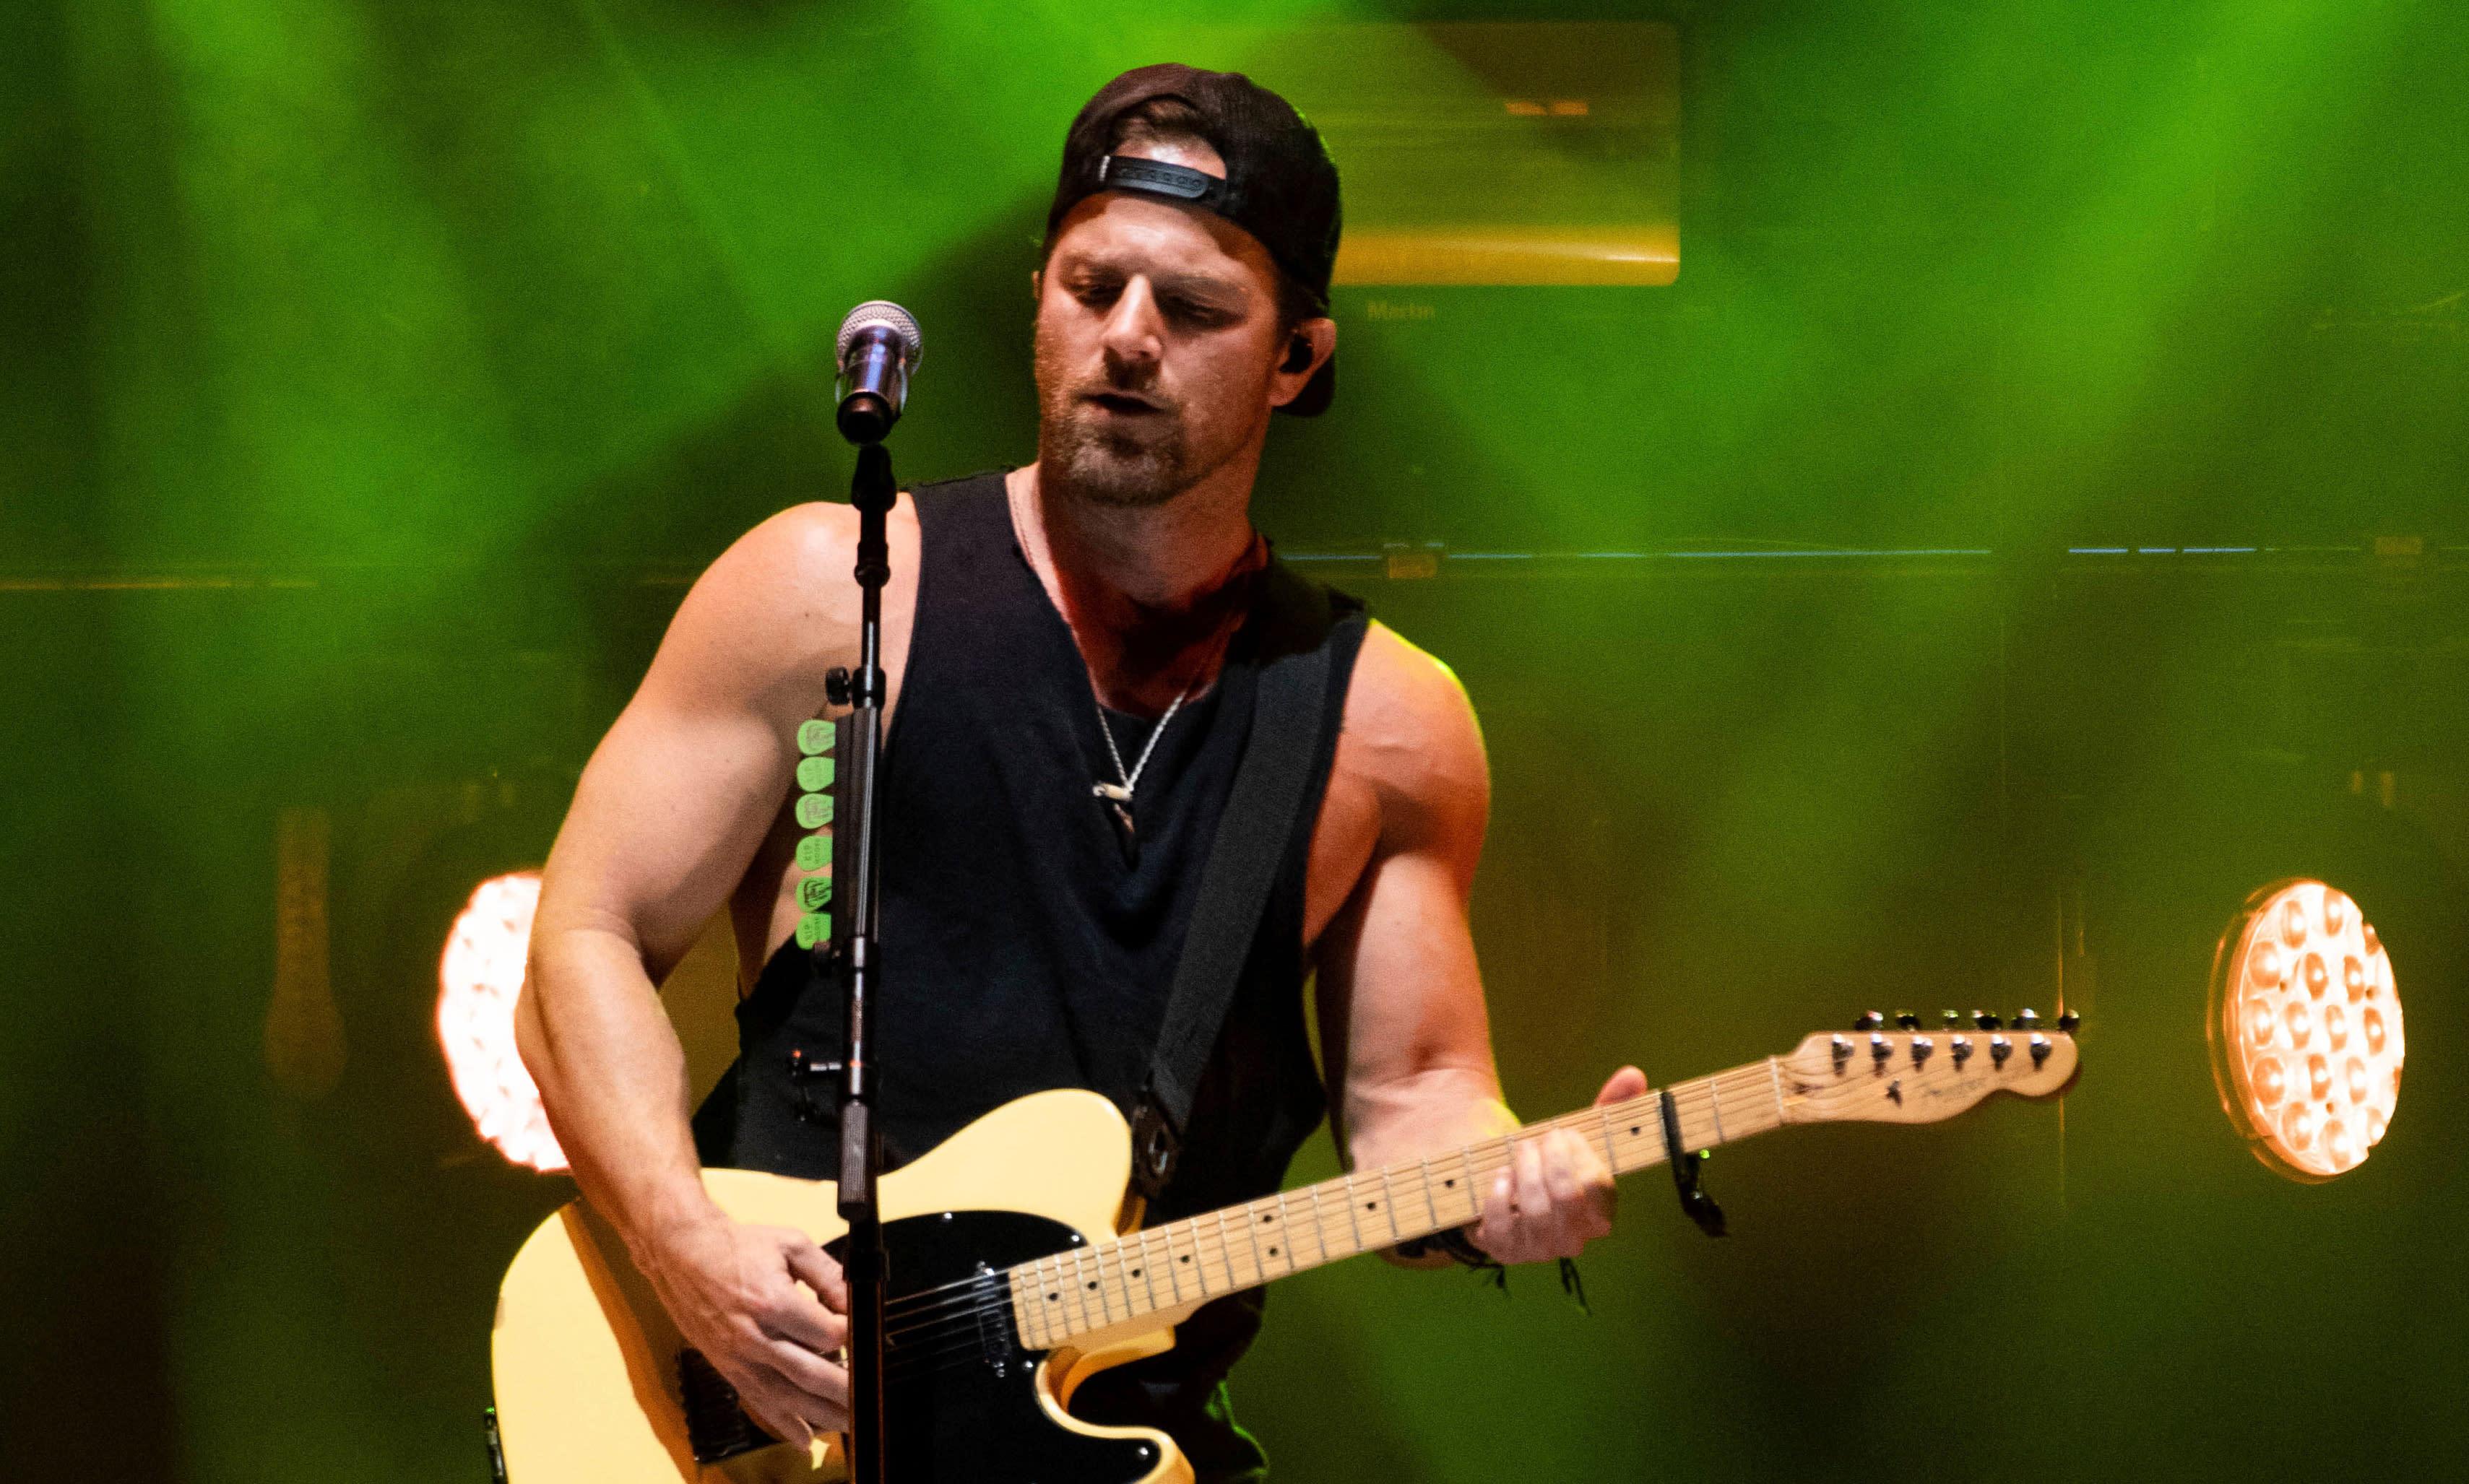 Kip Moore Previews New Album With Heartland Rocker 'She's Mine'